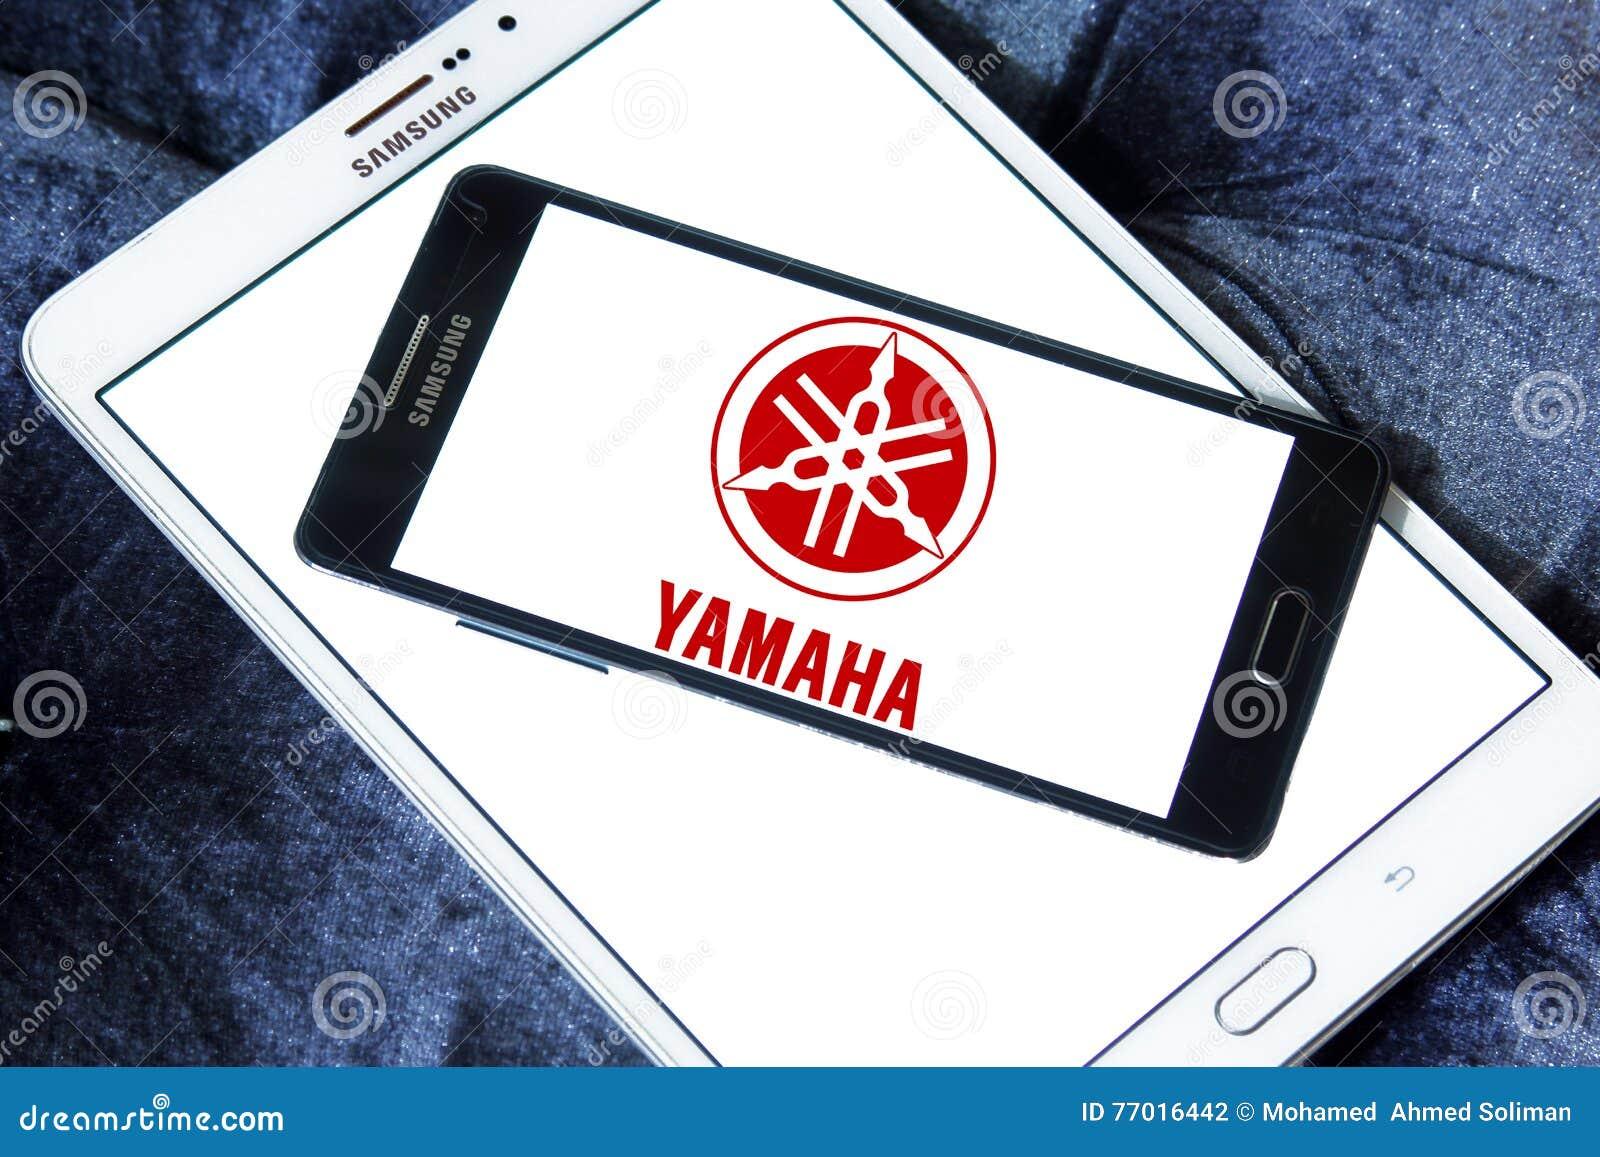 Yamaha Motor Logo Editorial Photography Image Of Speed 77016442